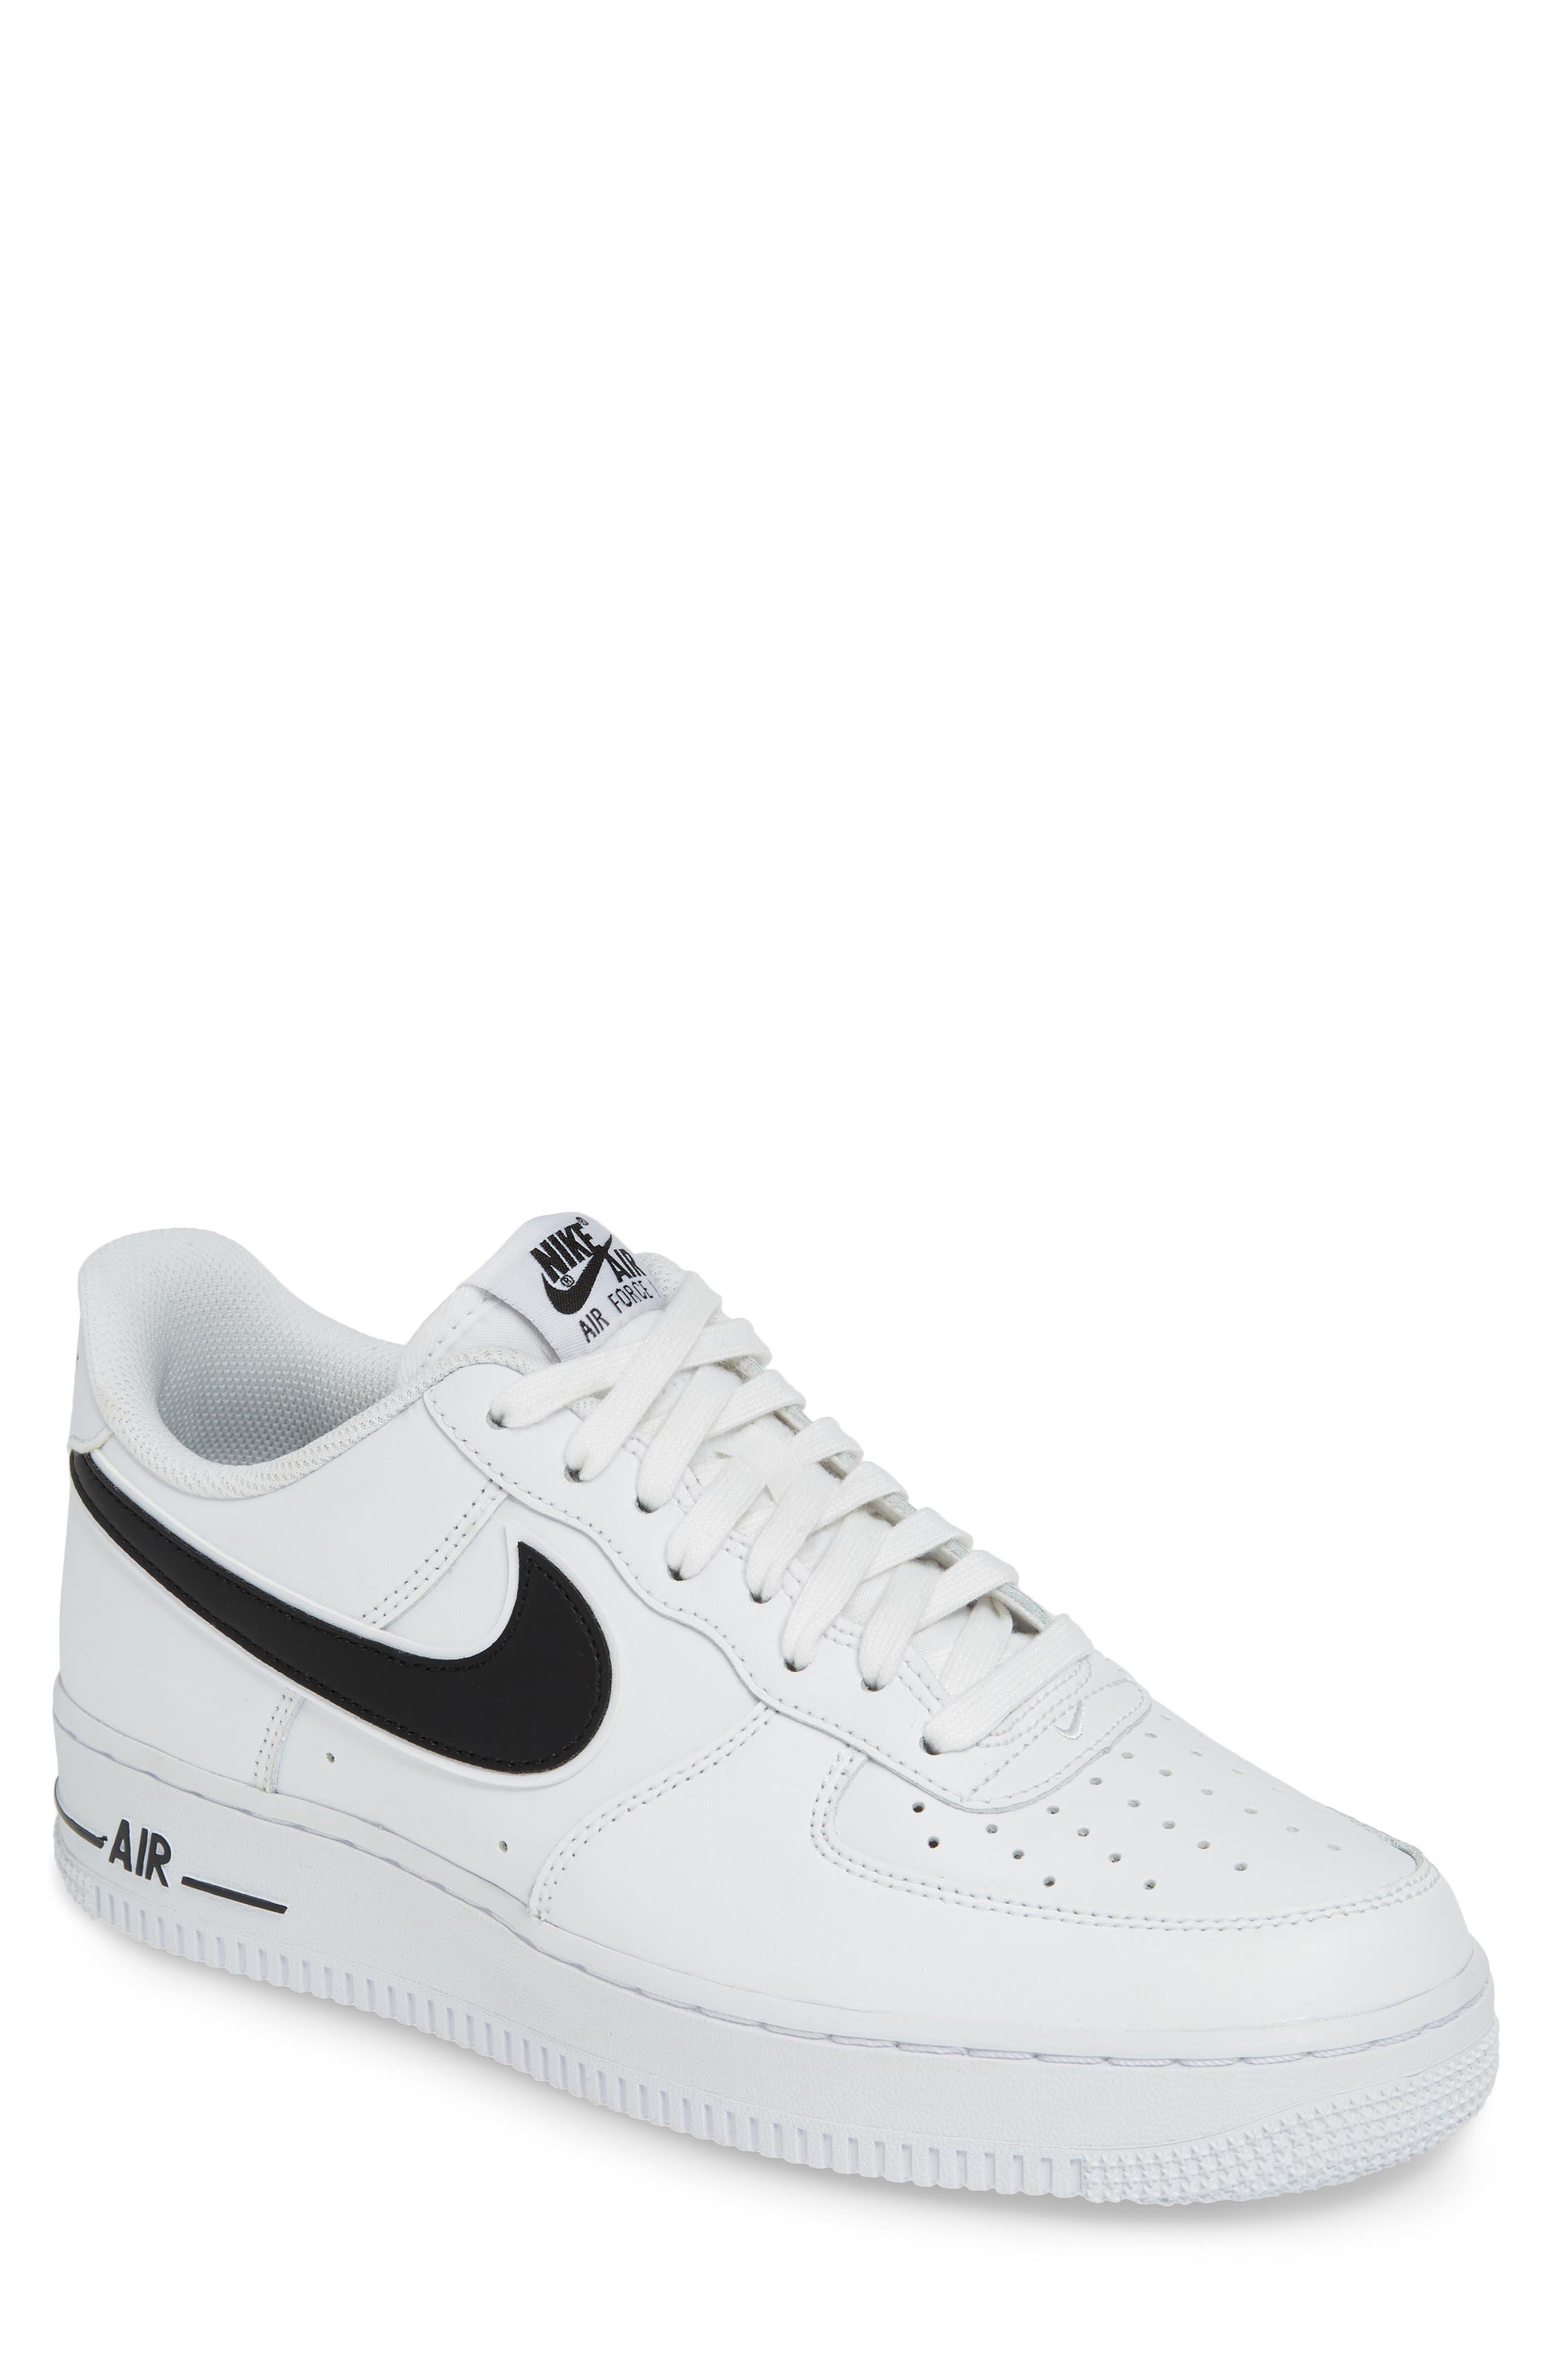 NIKE Air Force 1 '07 3 Sneaker, Main, color, WHITE/ BLACK